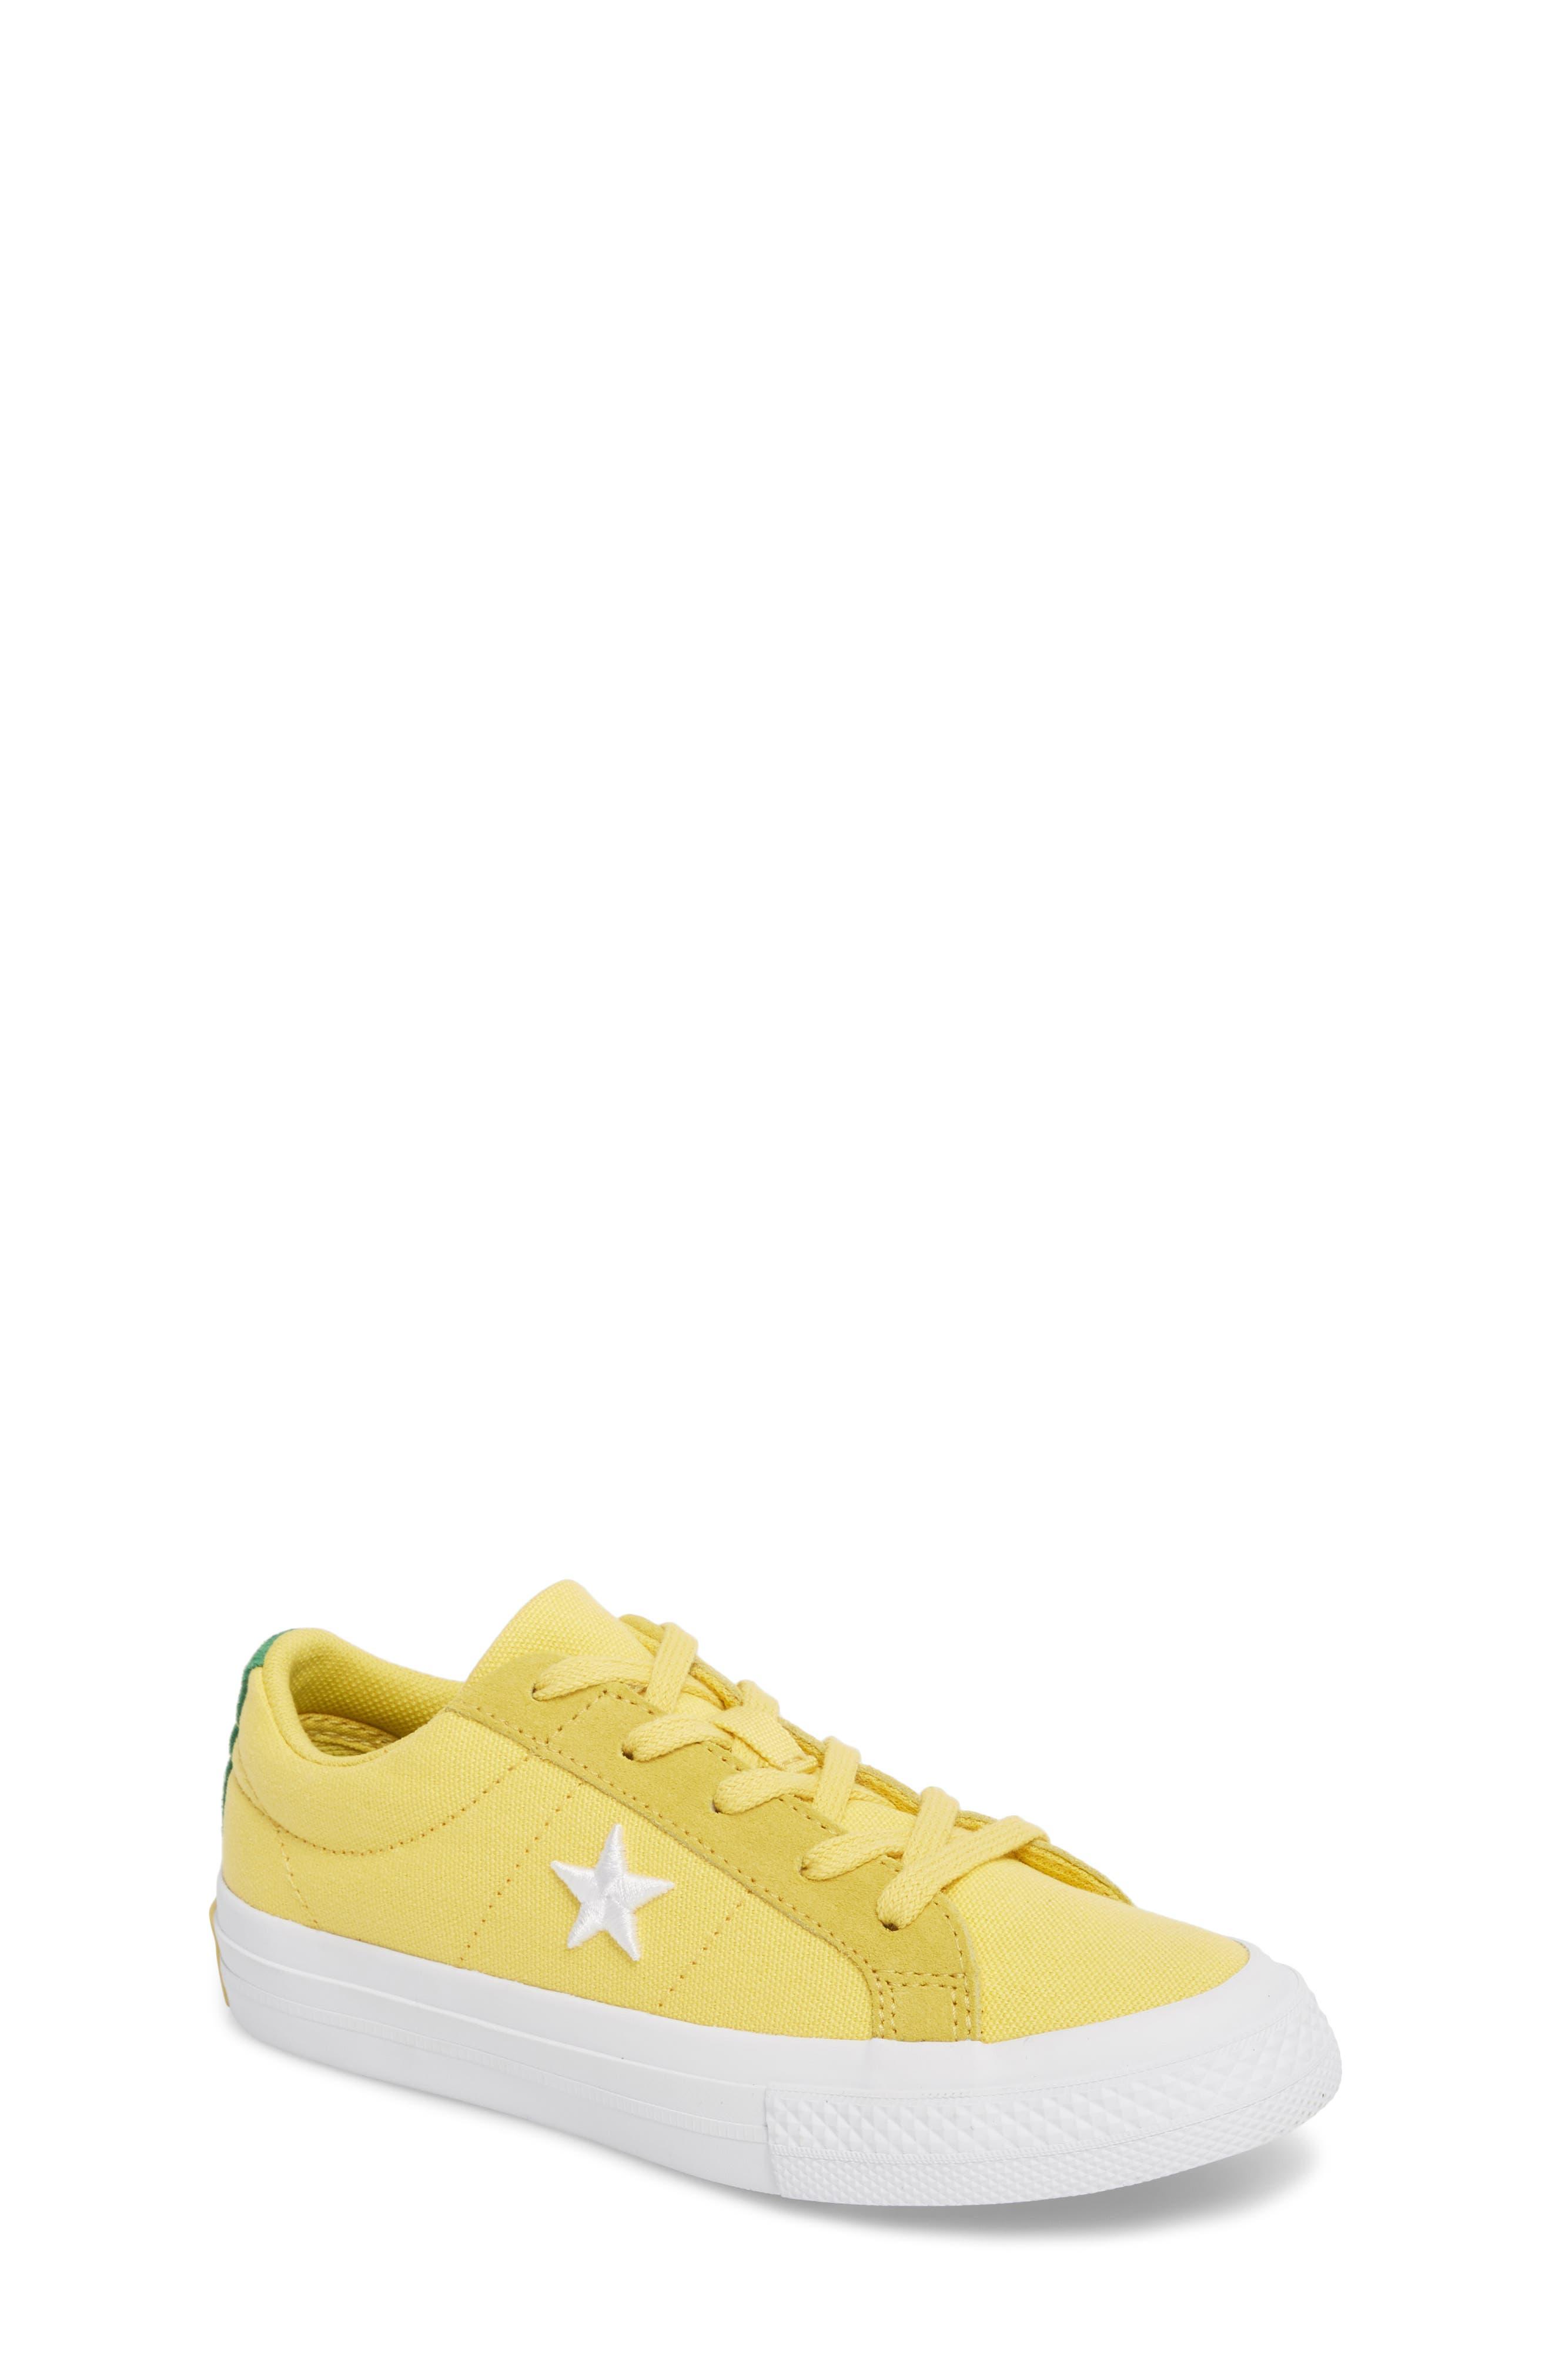 Converse One Star Low-Top Sneaker (Baby, Walker, Toddler & Little Kid)